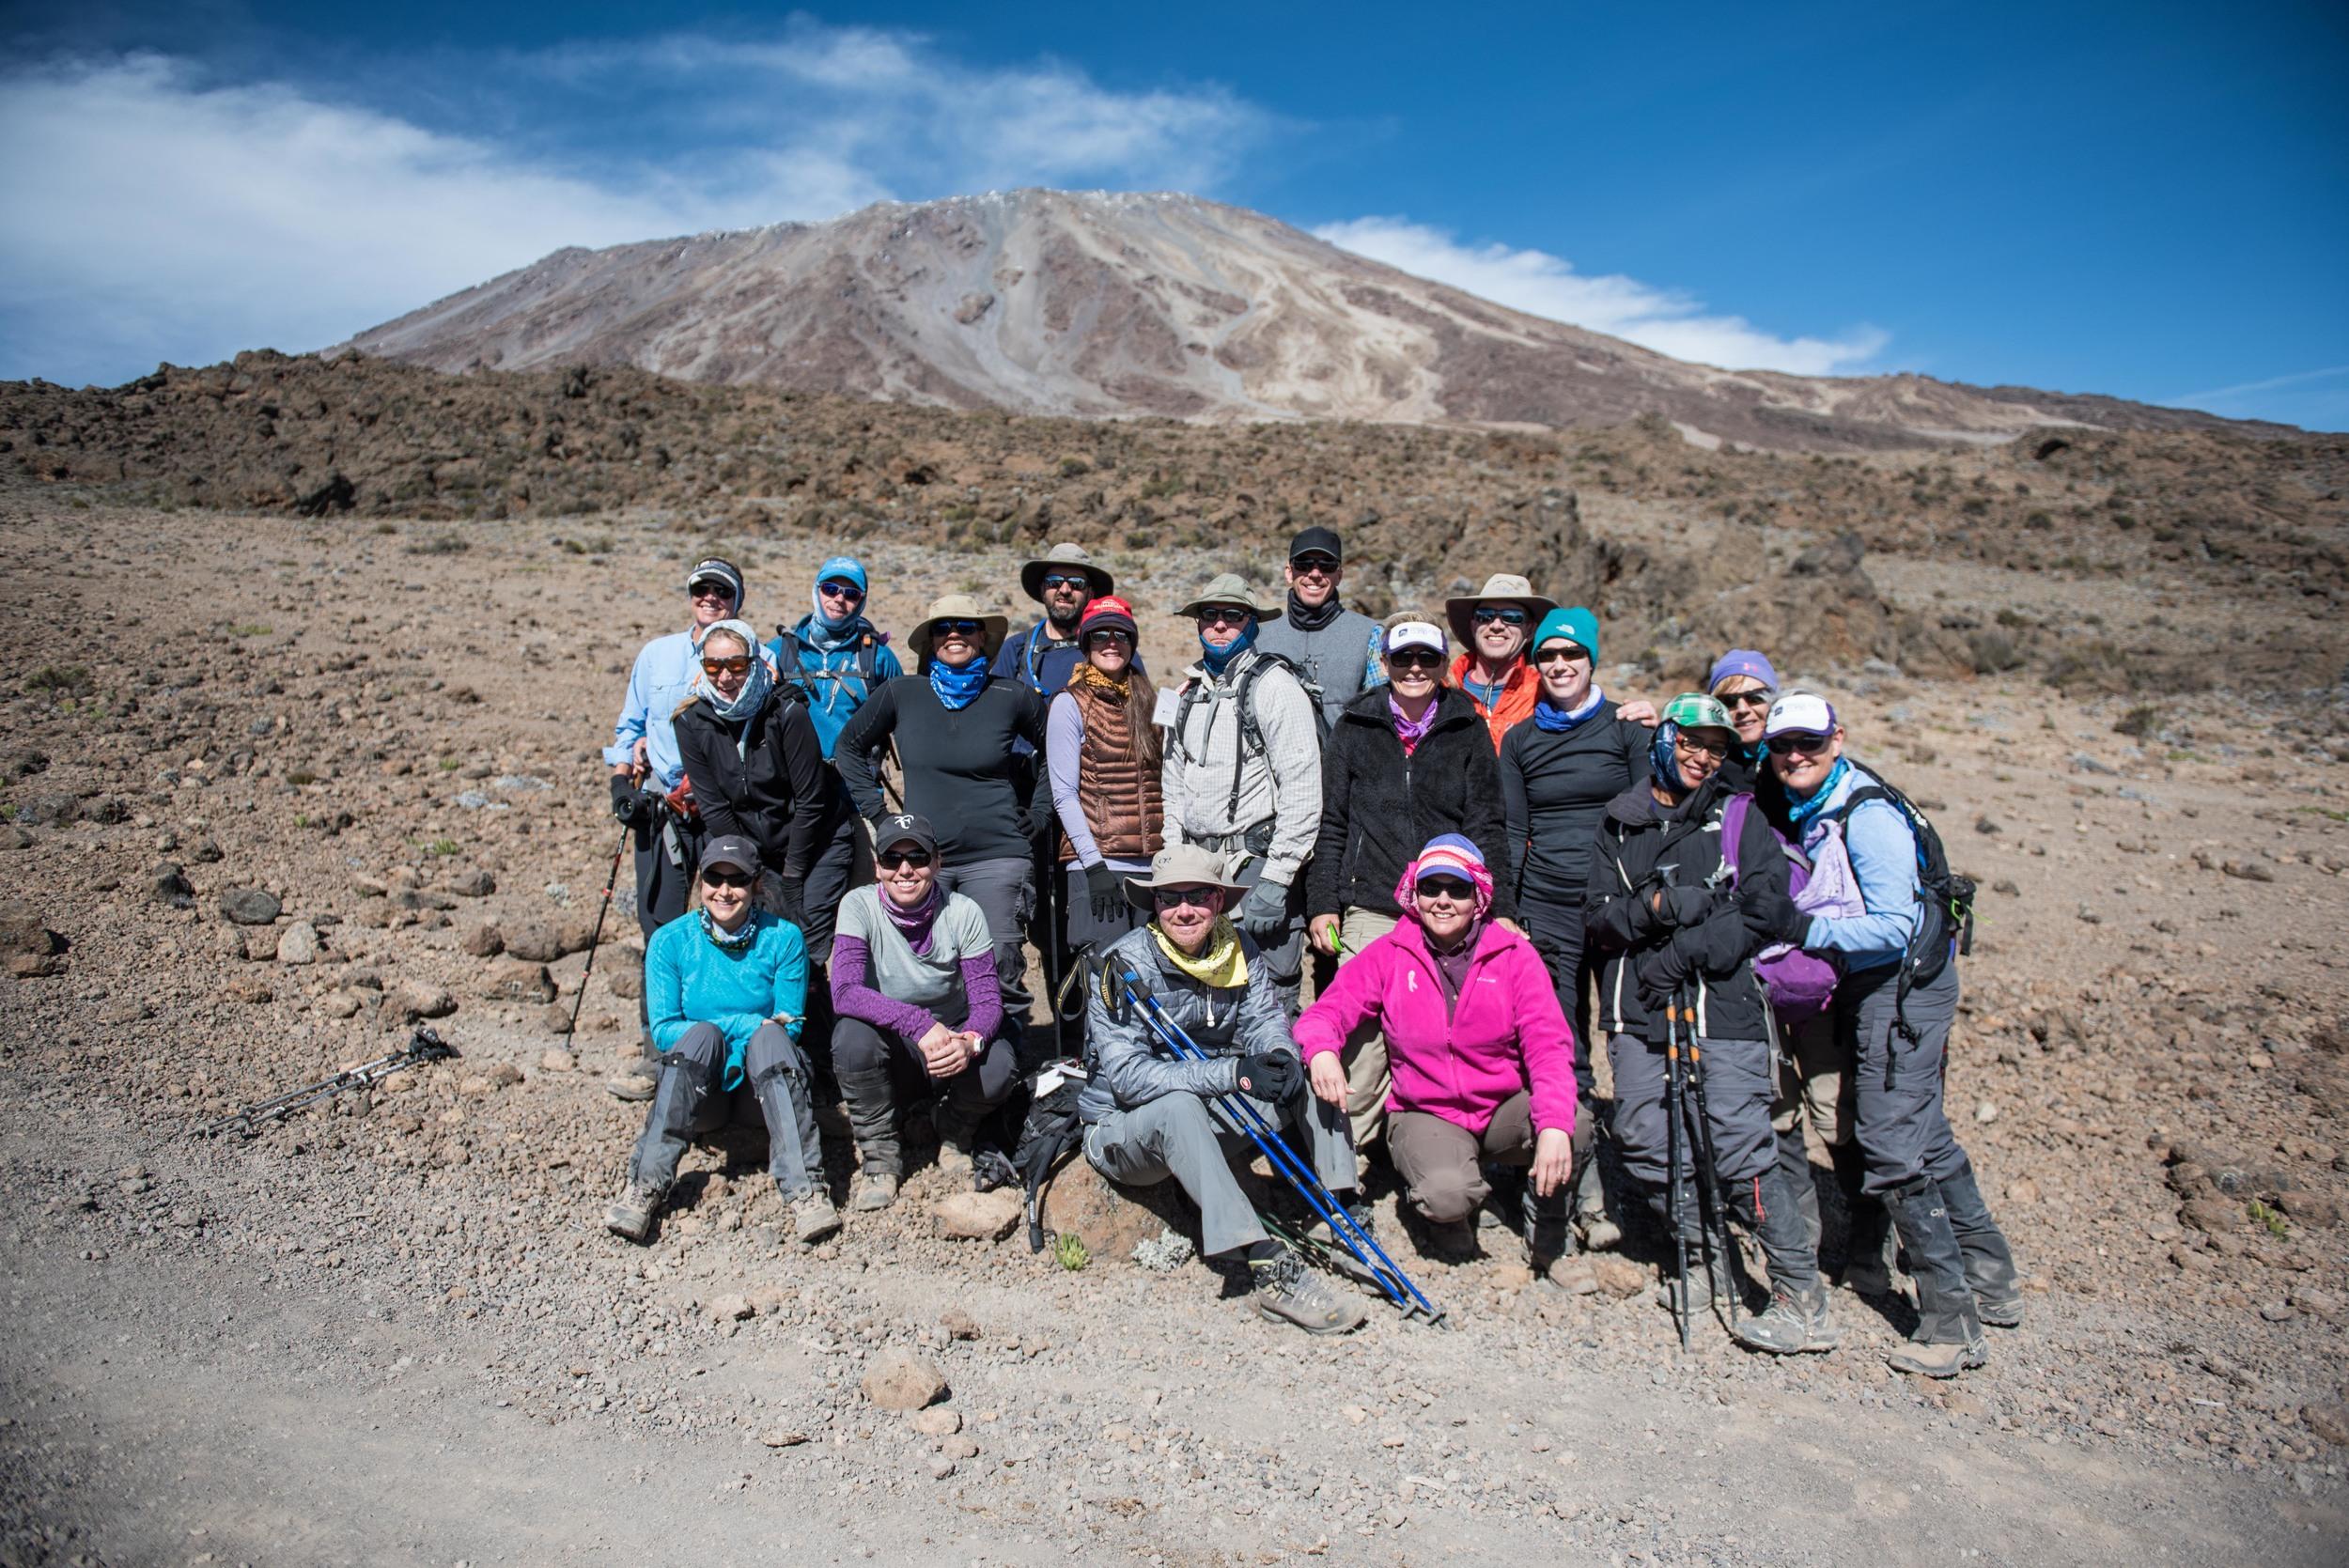 WEB_Kilimanjaro-25.jpg